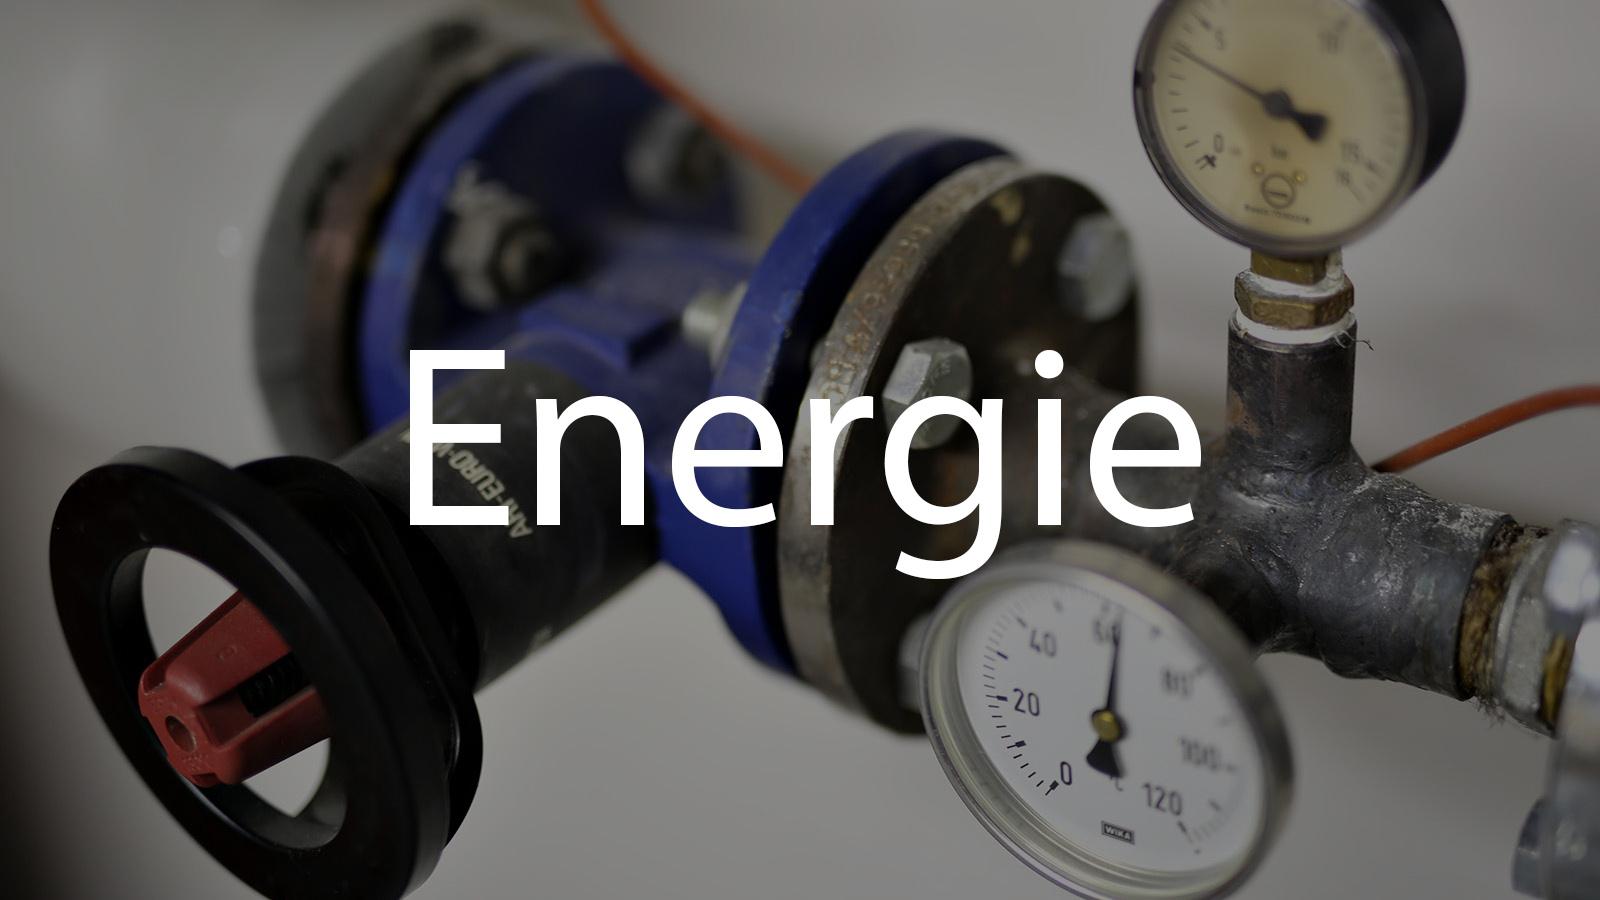 Energieplanung Architekturbuero Reitberger